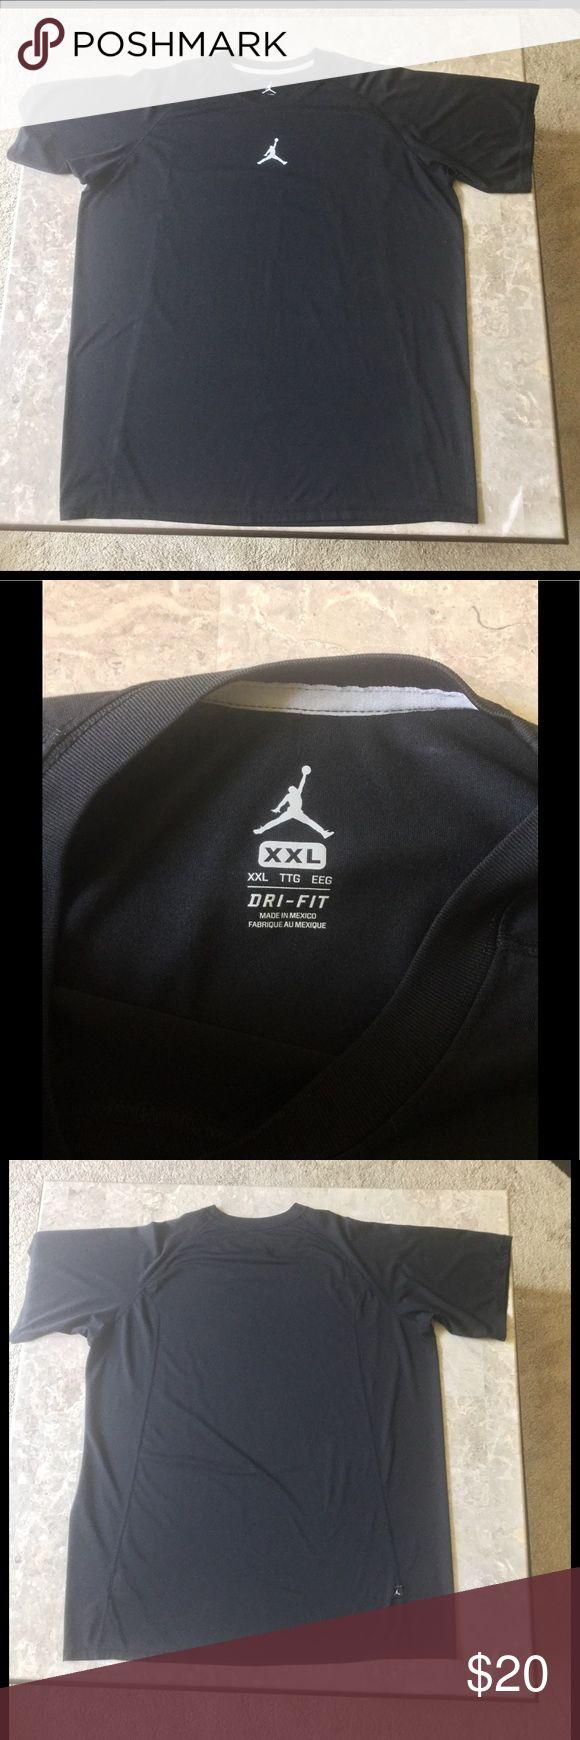 Michael Jordan T shirt, men's Jump man midnight black sport t, short sleeved, drip fit. Like new Jordan Shirts Tees - Short Sleeve